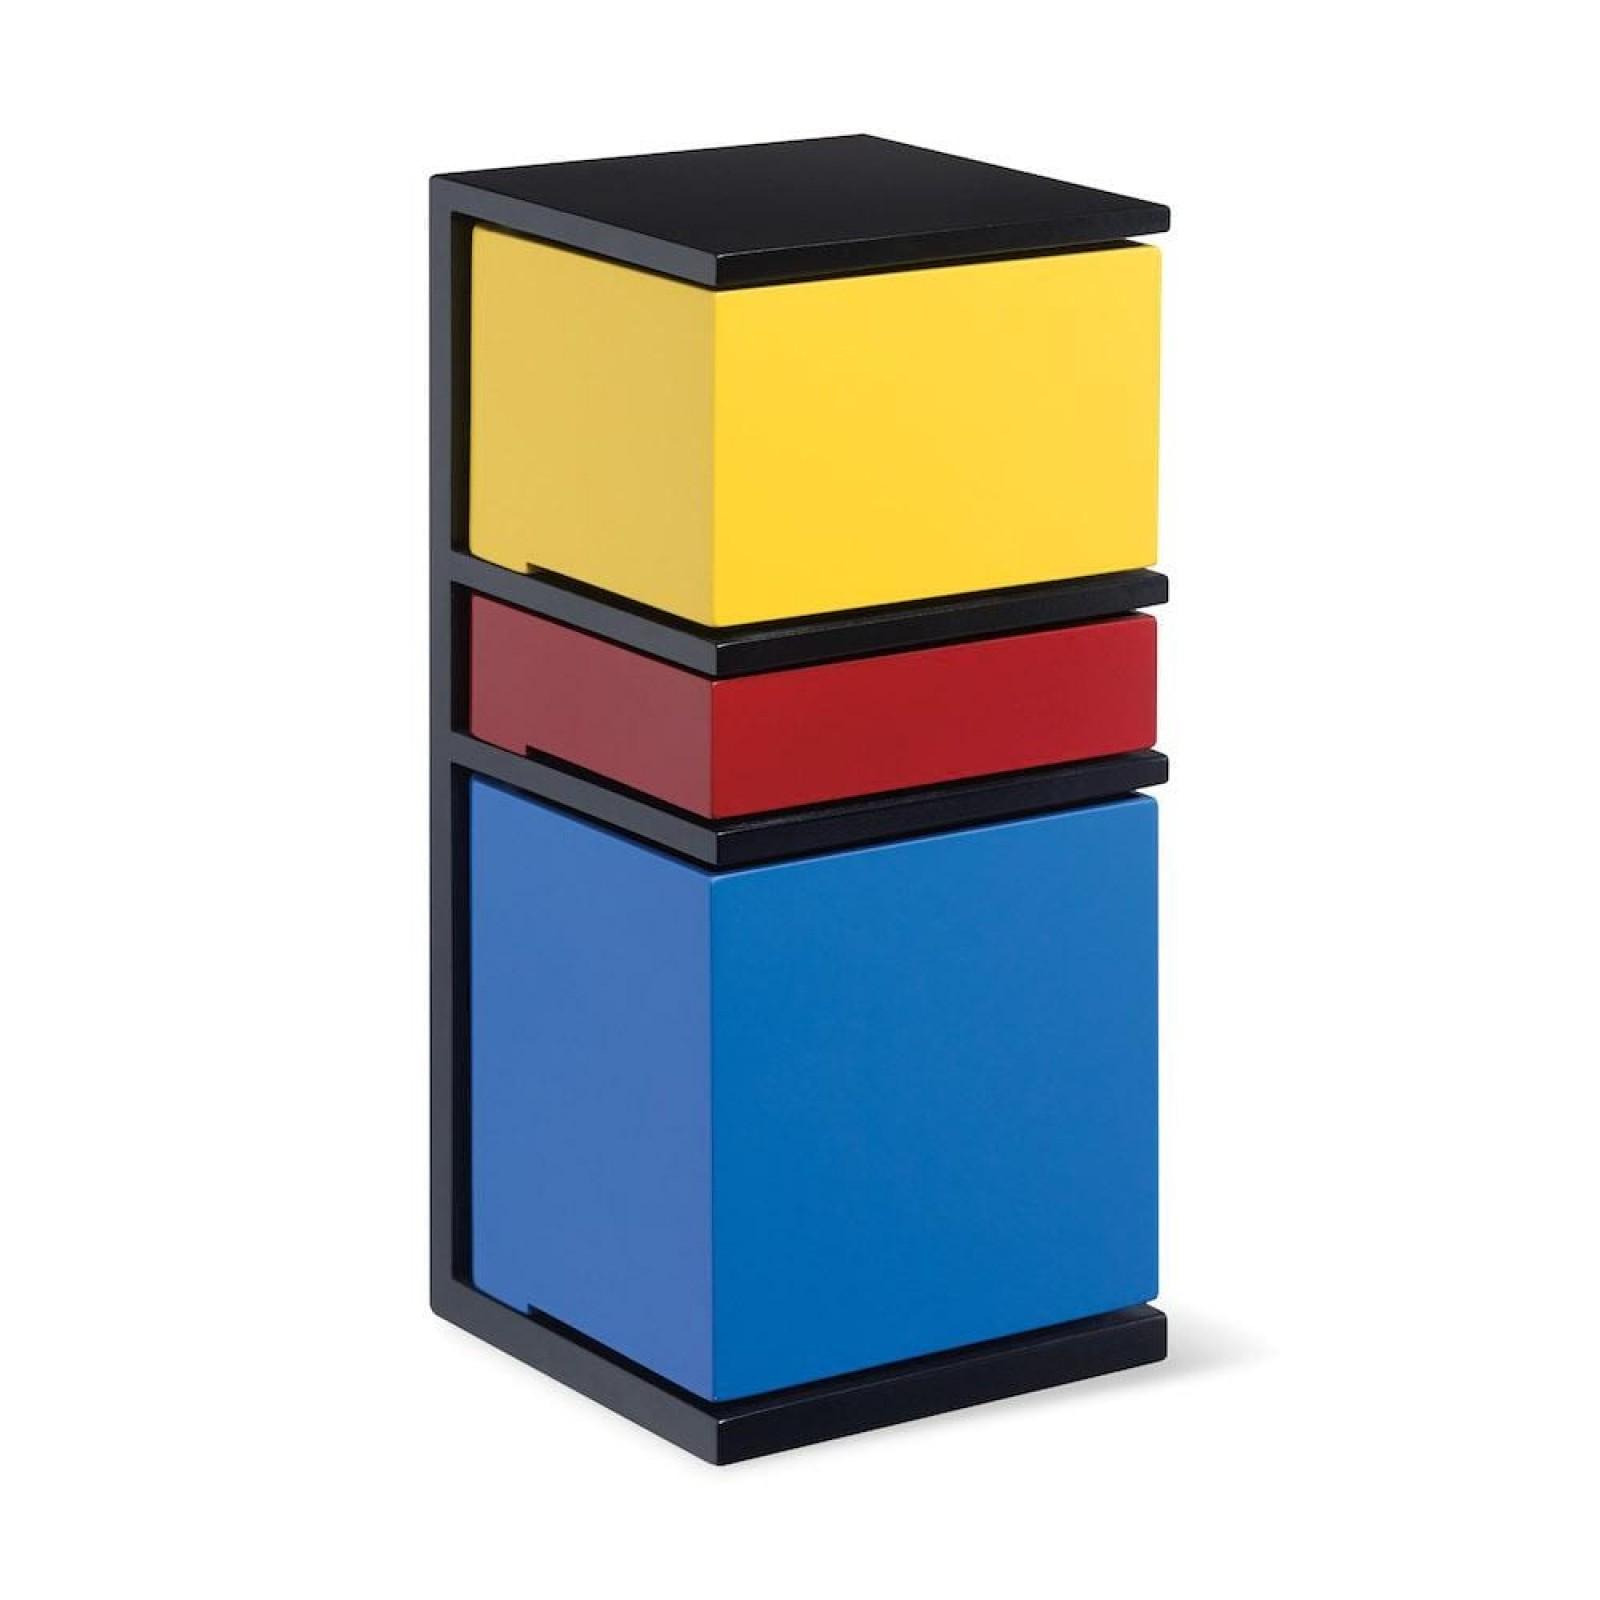 De Stijl Storage Tower - MoMA